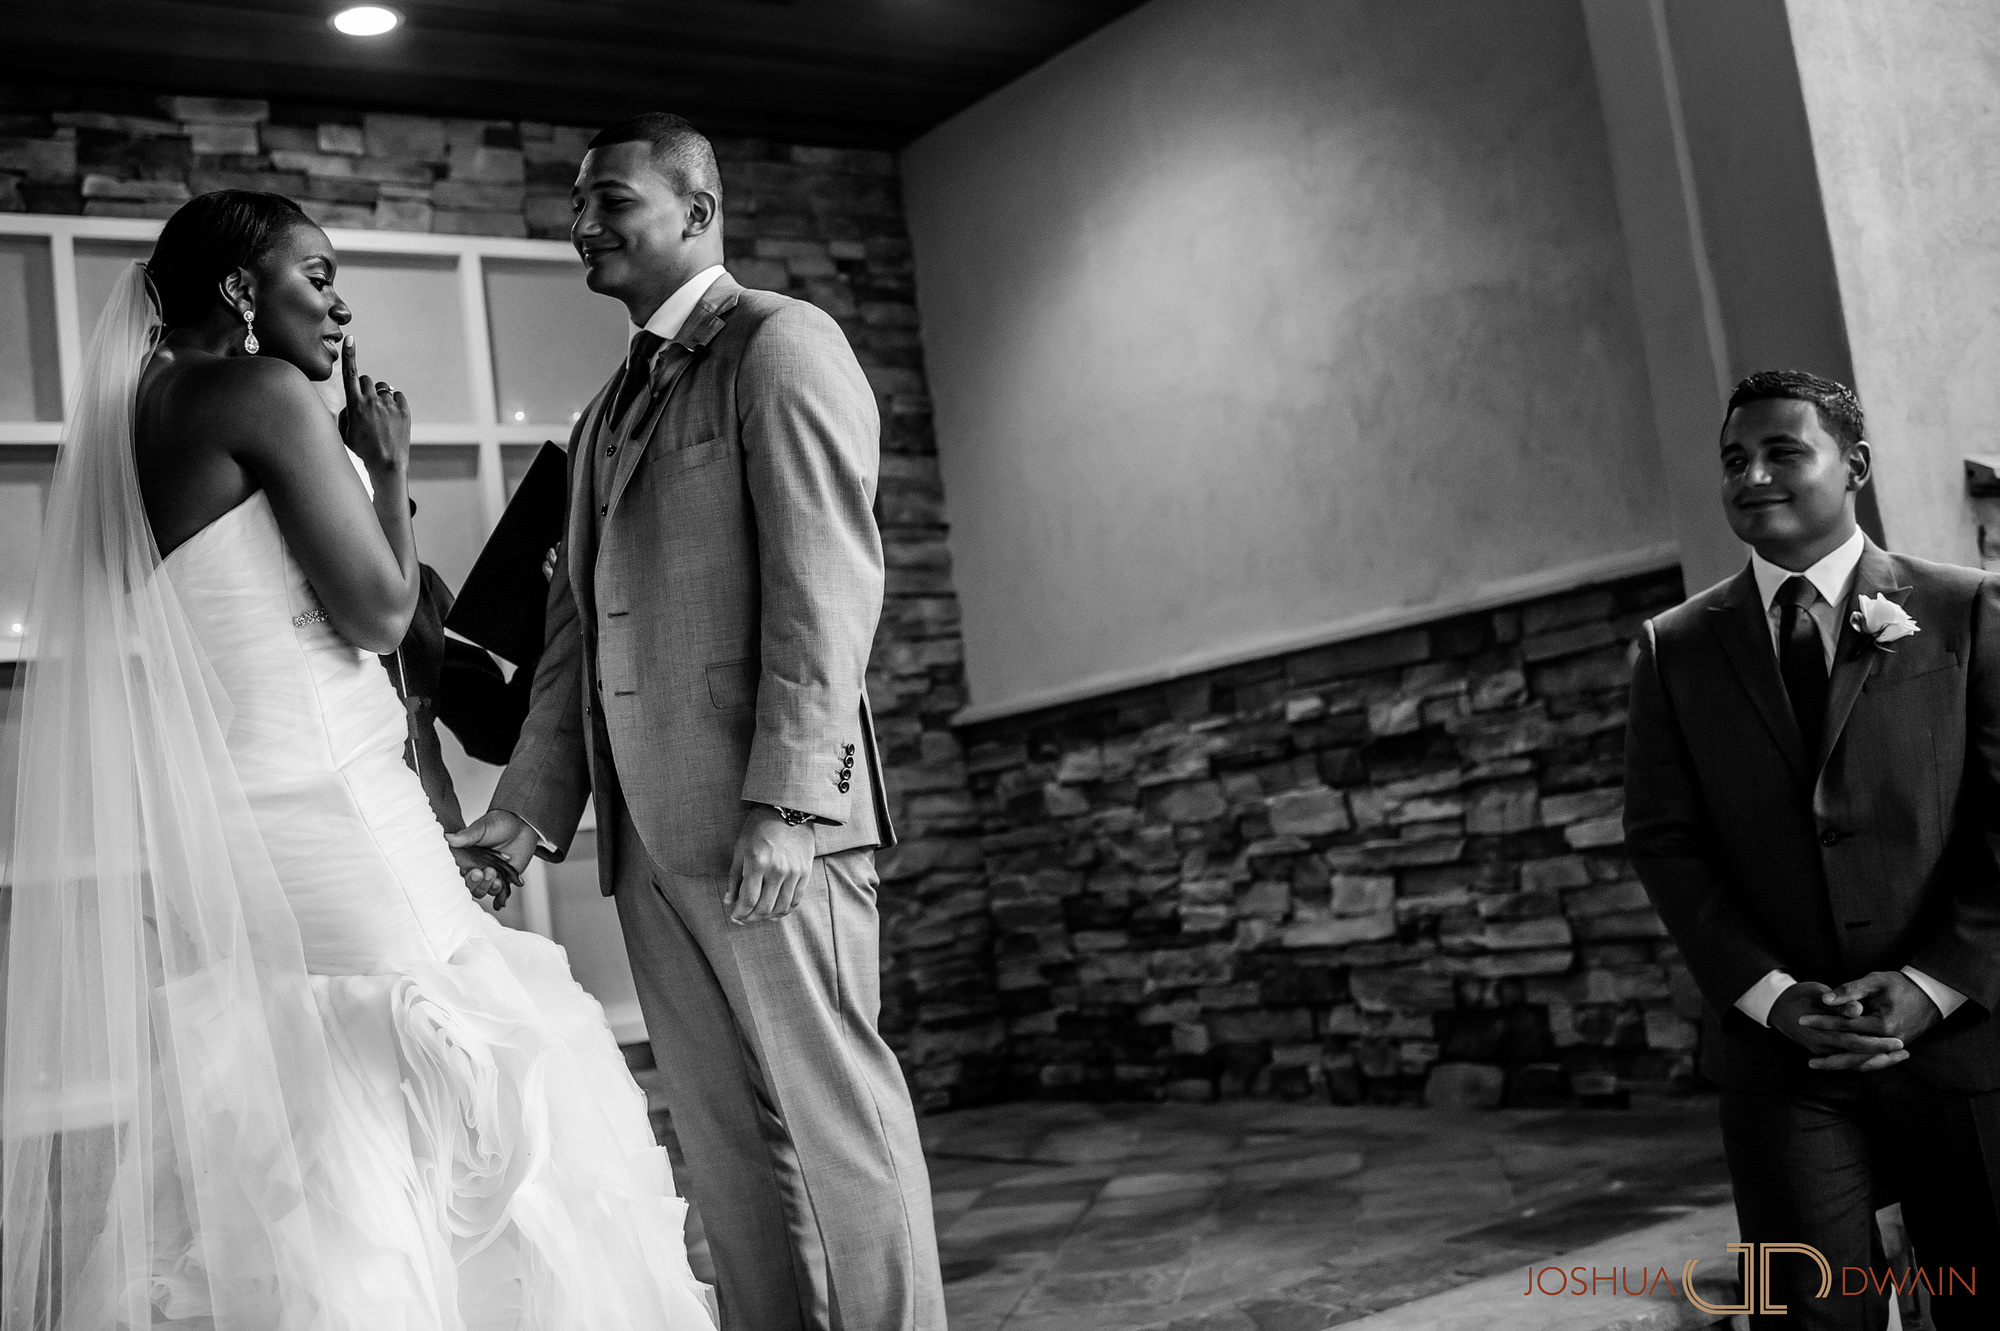 anna-edwin-020-stone-house-warren-new-jersey-wedding-photographer-joshua-dwain